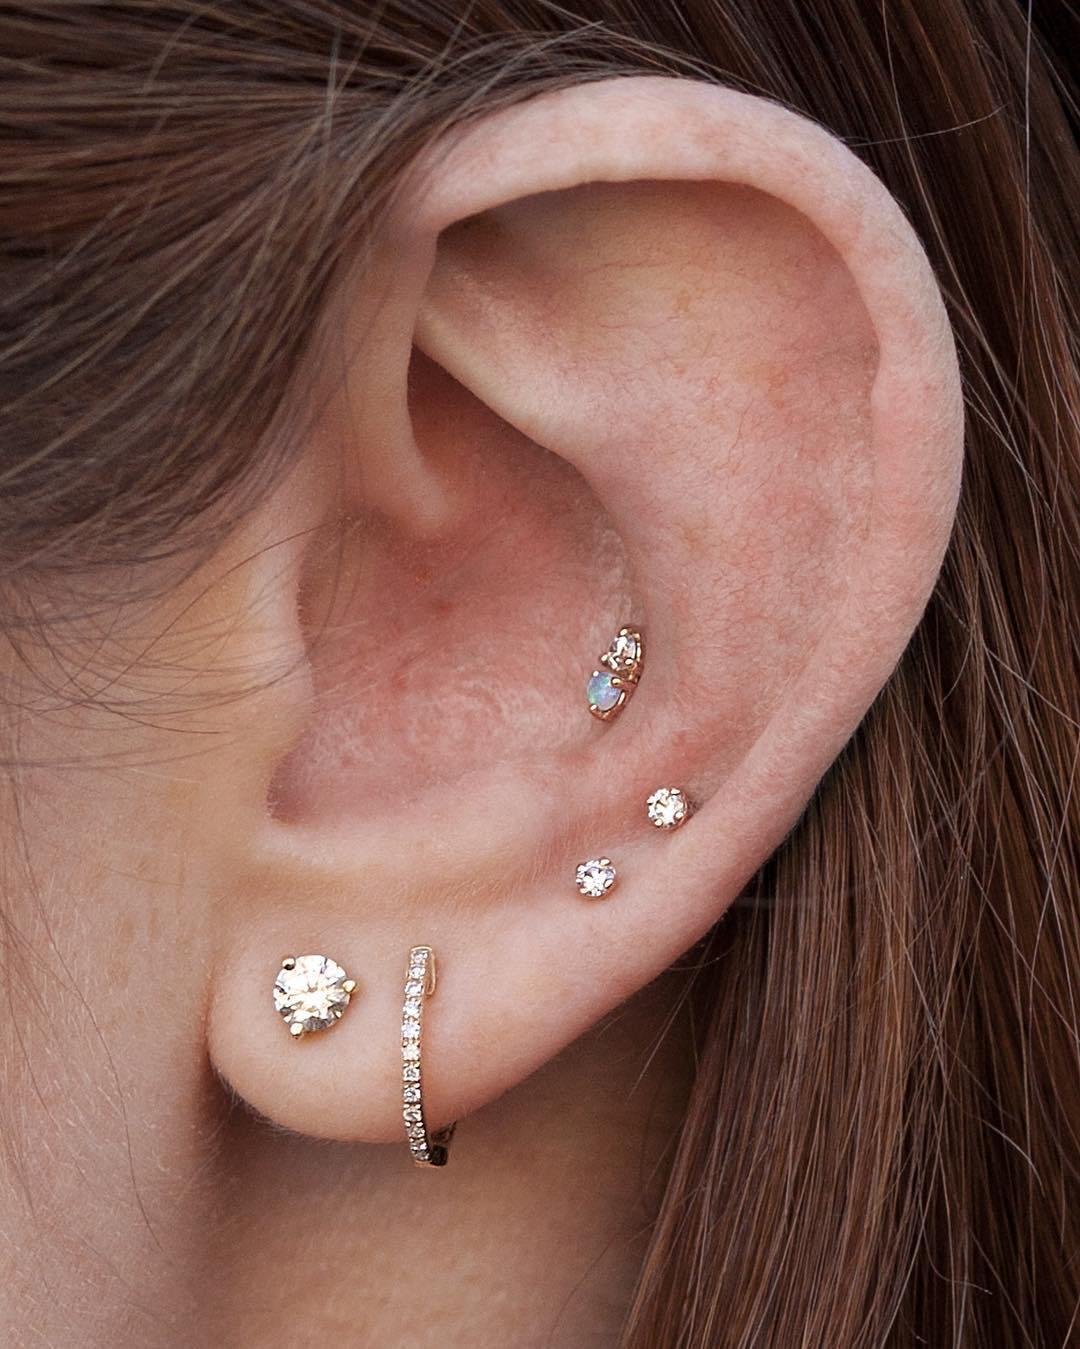 Find great deals on eBay for women pierced earrings. Shop with confidence.